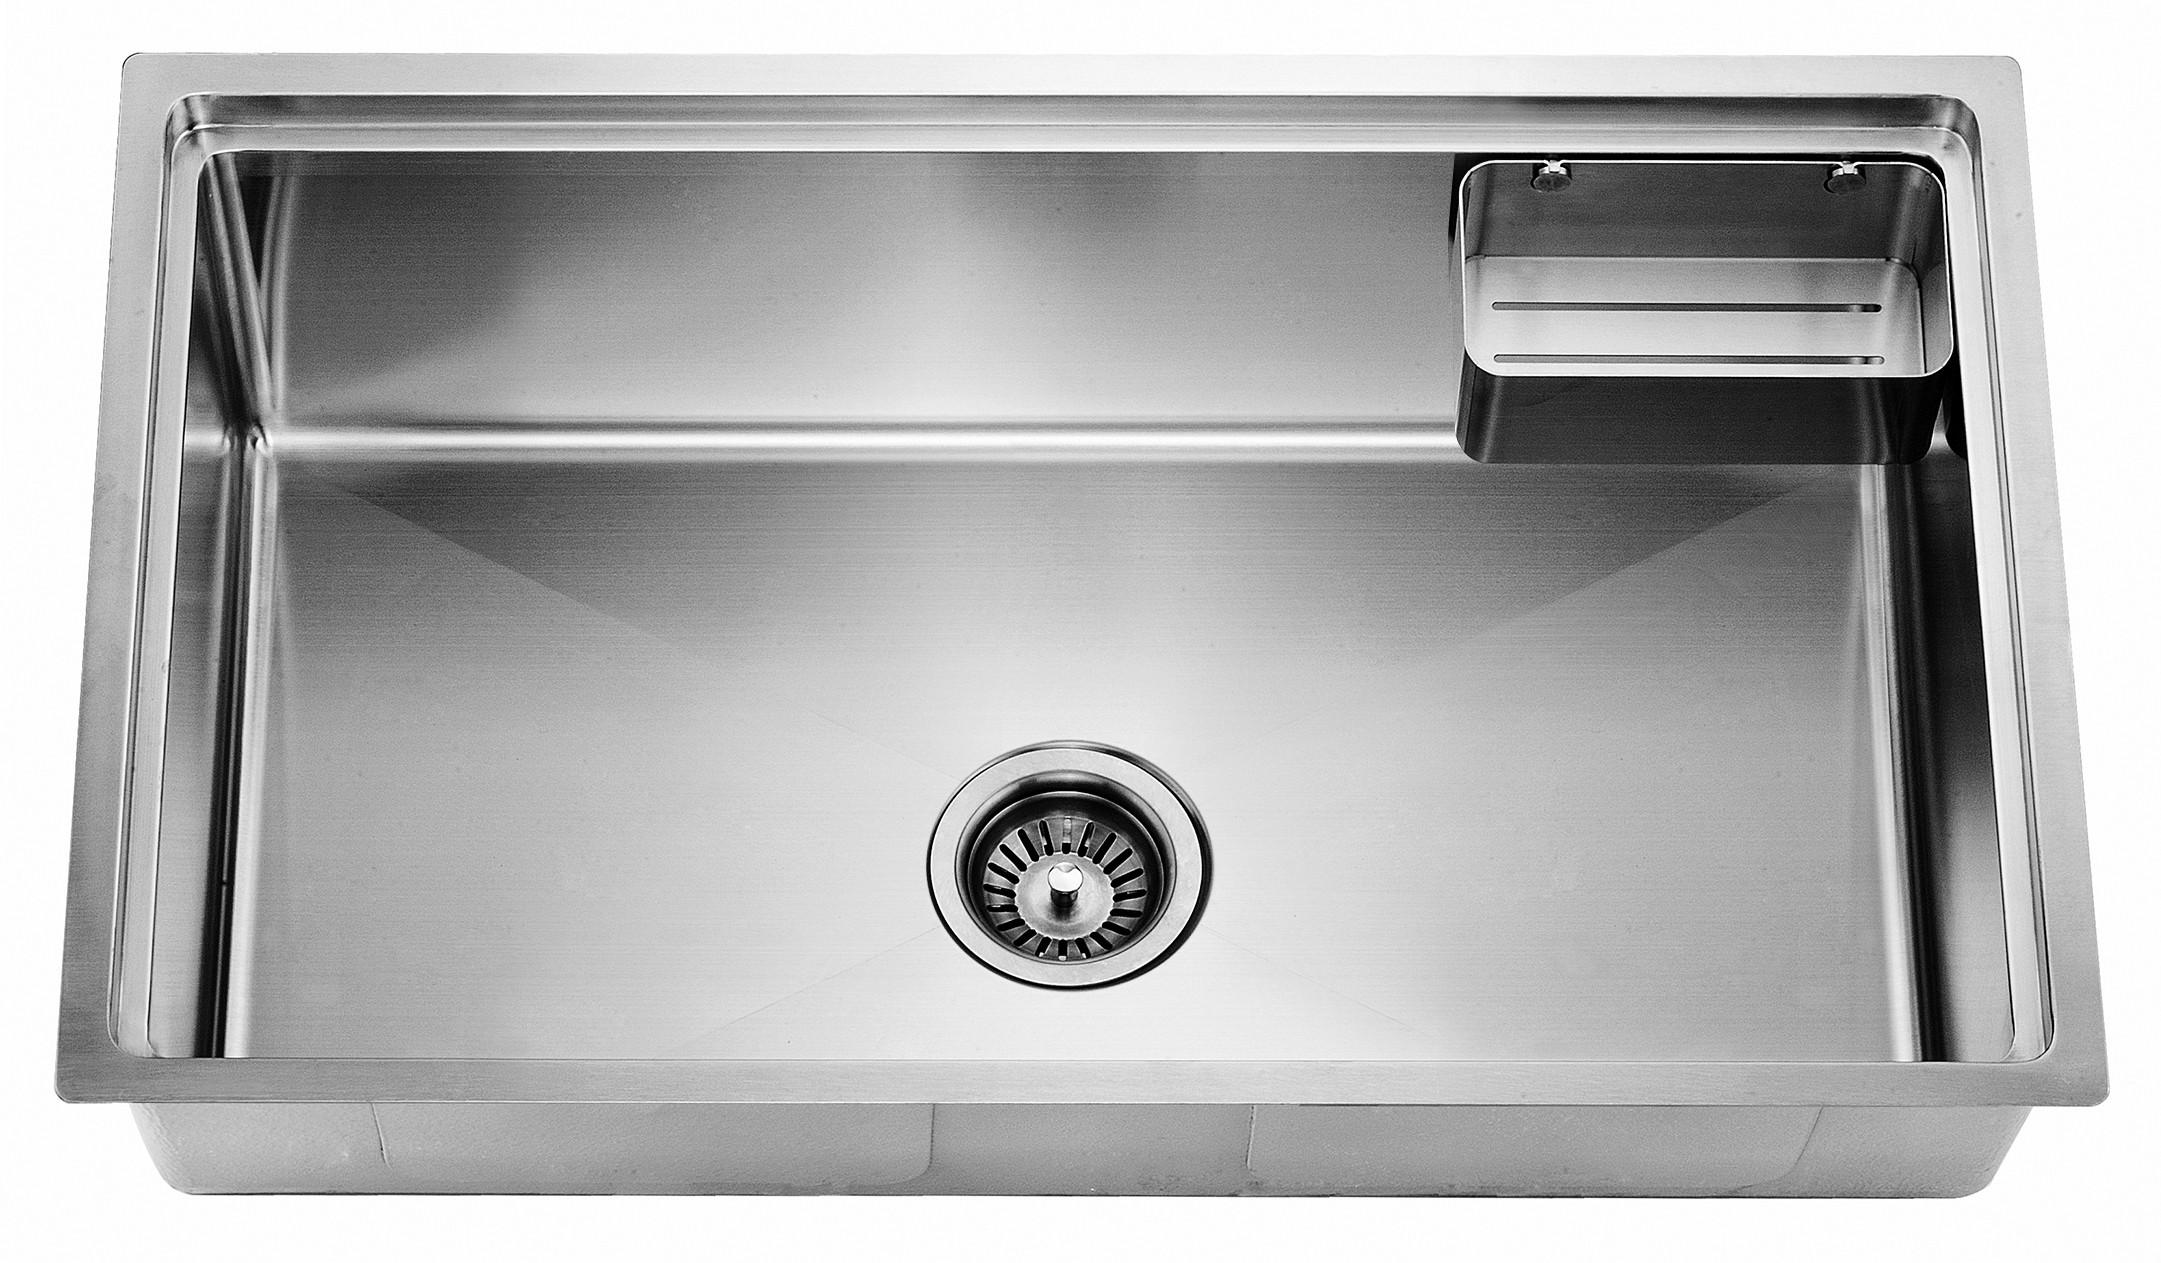 Dawn SRU281610 Undermount Small Corner Radius Single Bowl Kitchen Sink